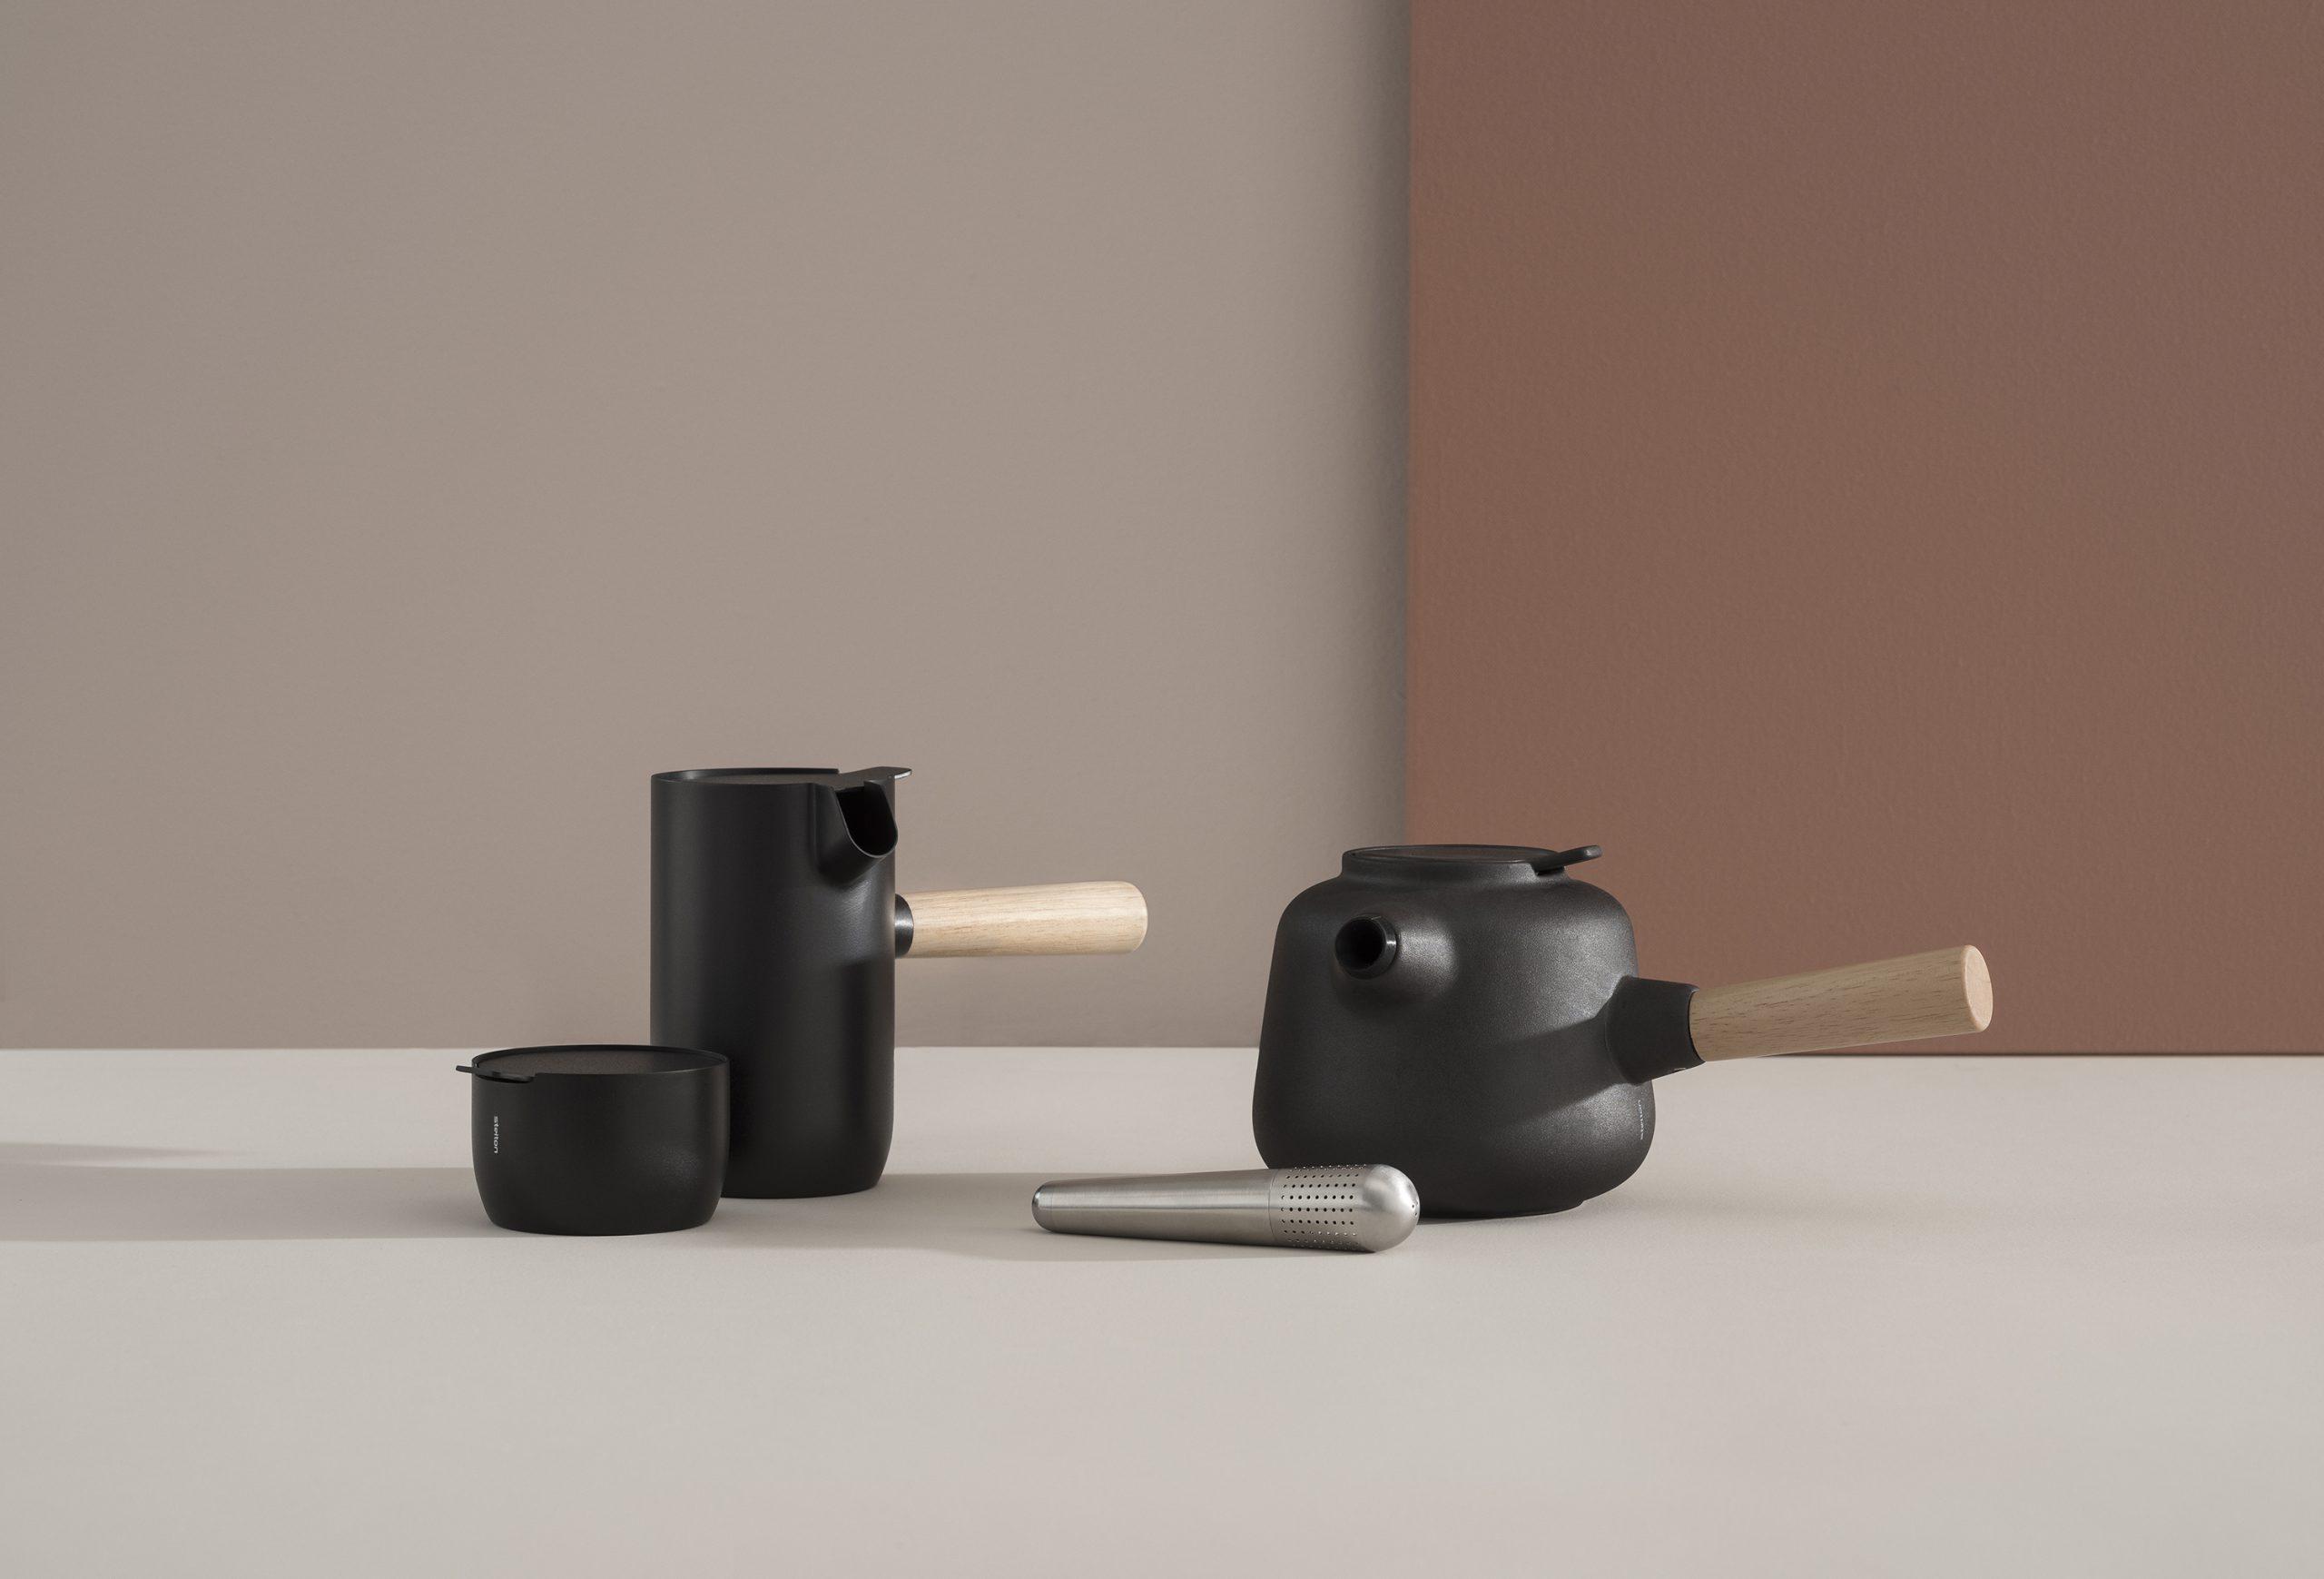 Collar Tea pot, milk pot, sugar bowl and teaegg by Debiasi Sandri for Stelton